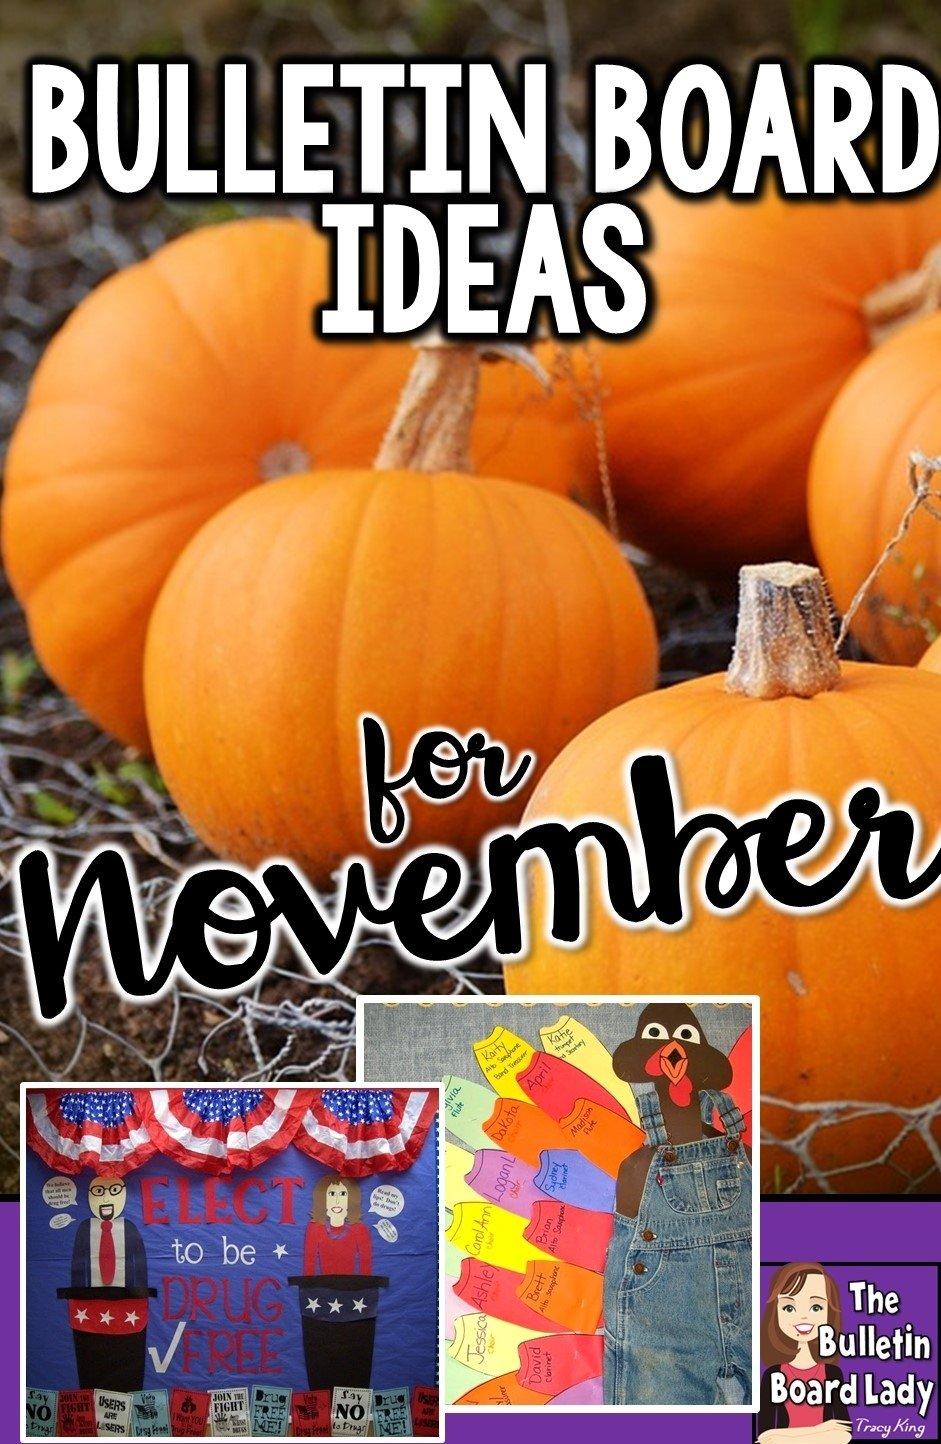 10 Famous Bulletin Board Ideas For November mrs kings music class november bulletin board ideas 2021